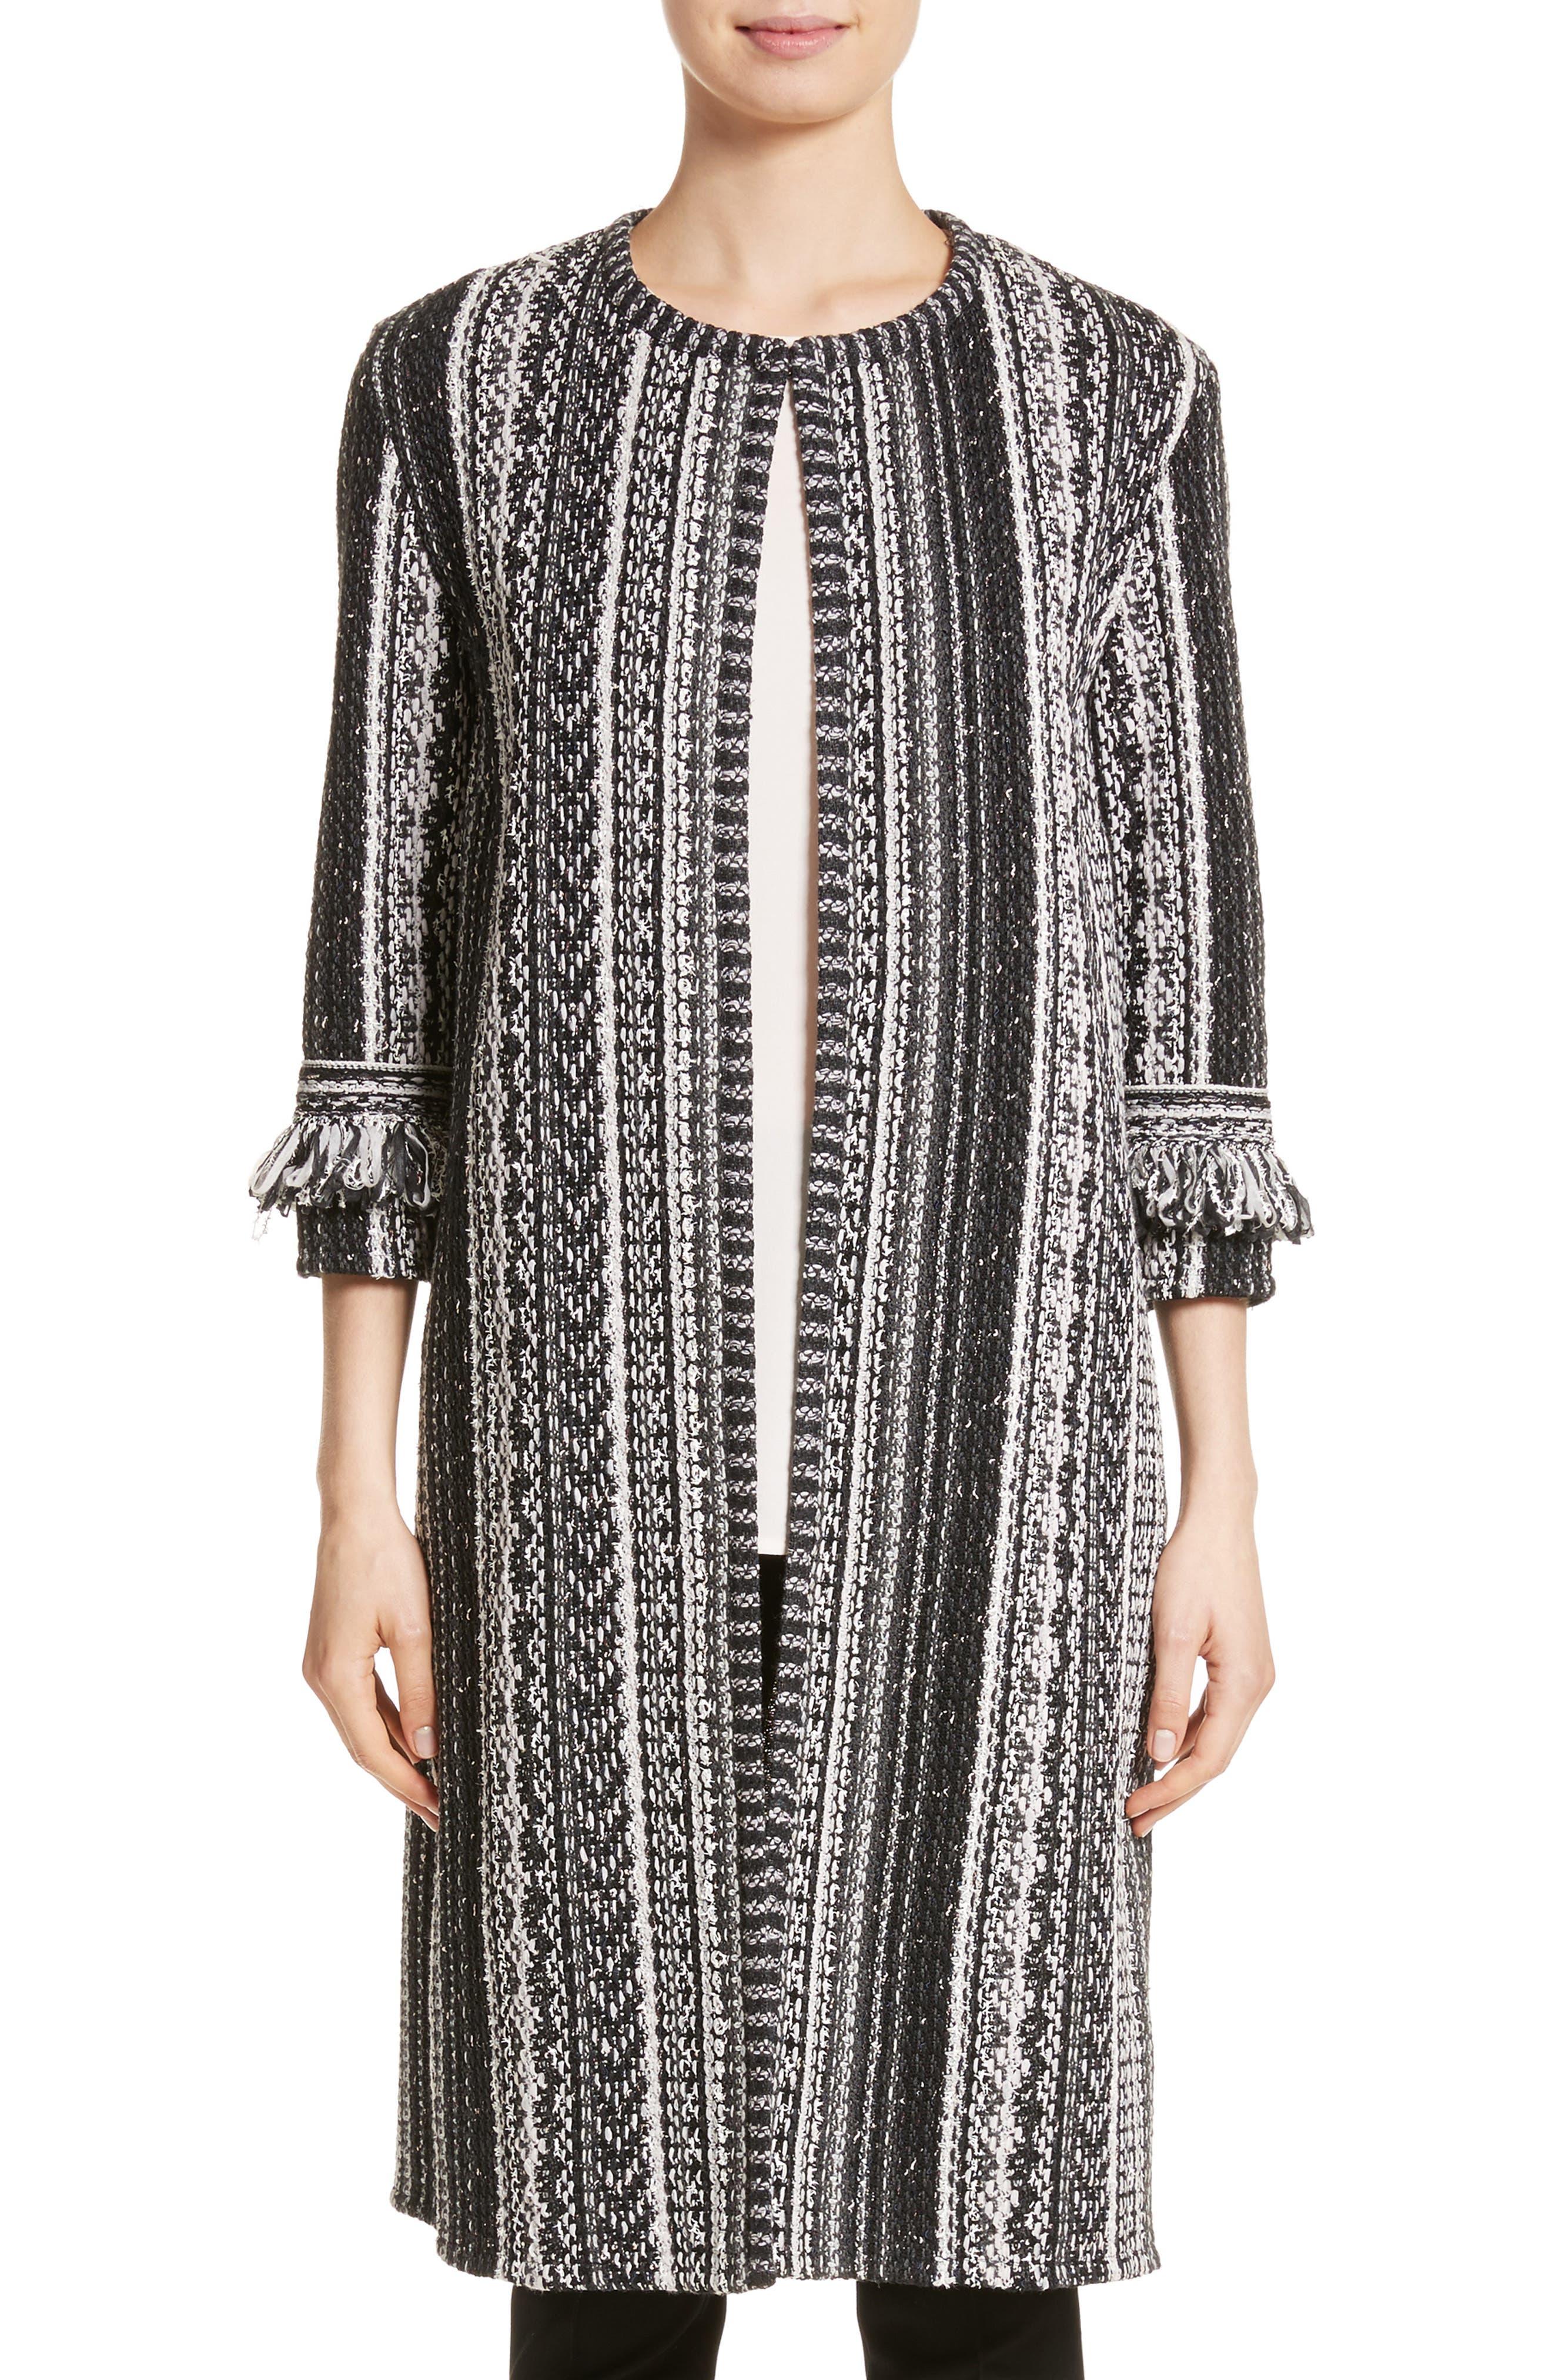 Fringe Ombré Stripe Tweed Knit Jacket,                             Main thumbnail 1, color,                             001